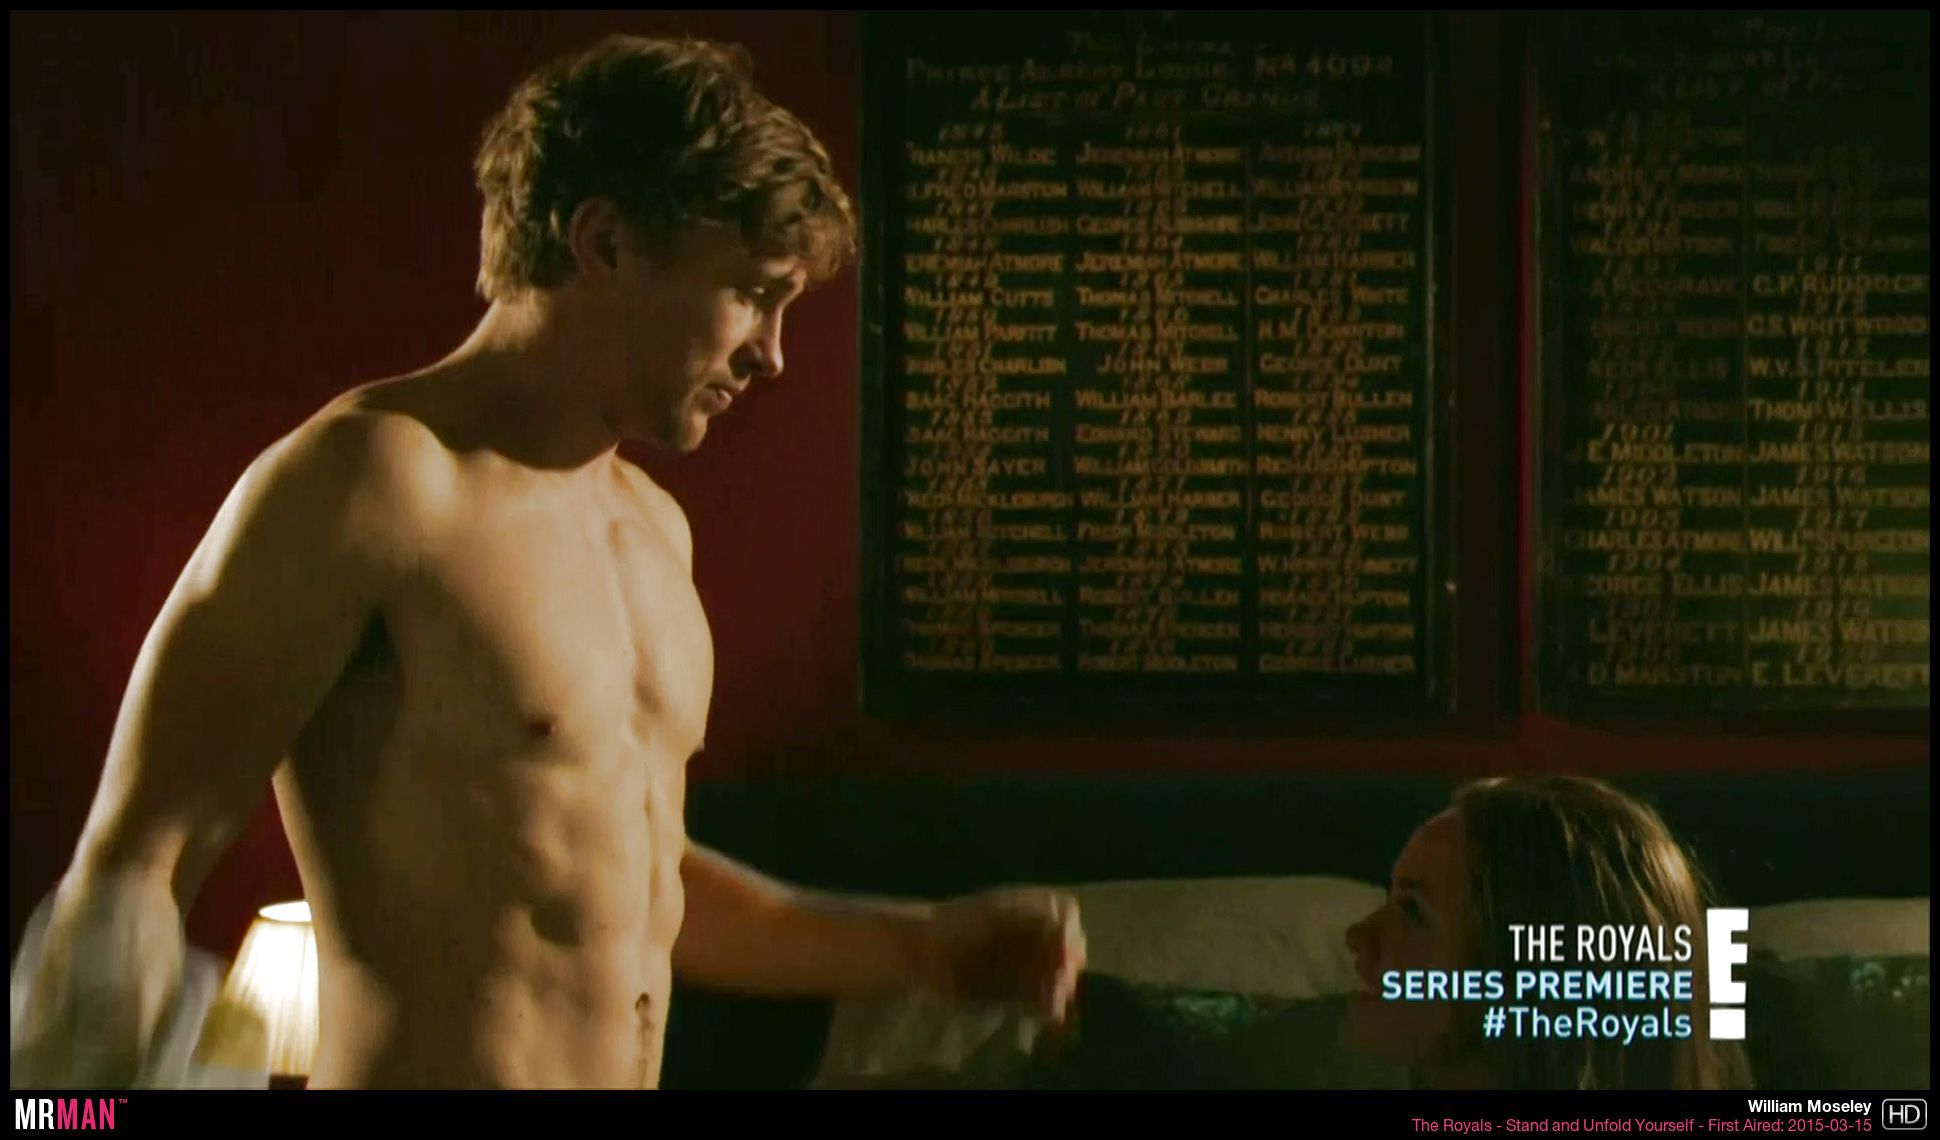 William moseley shirtless skandar keynes drinkin